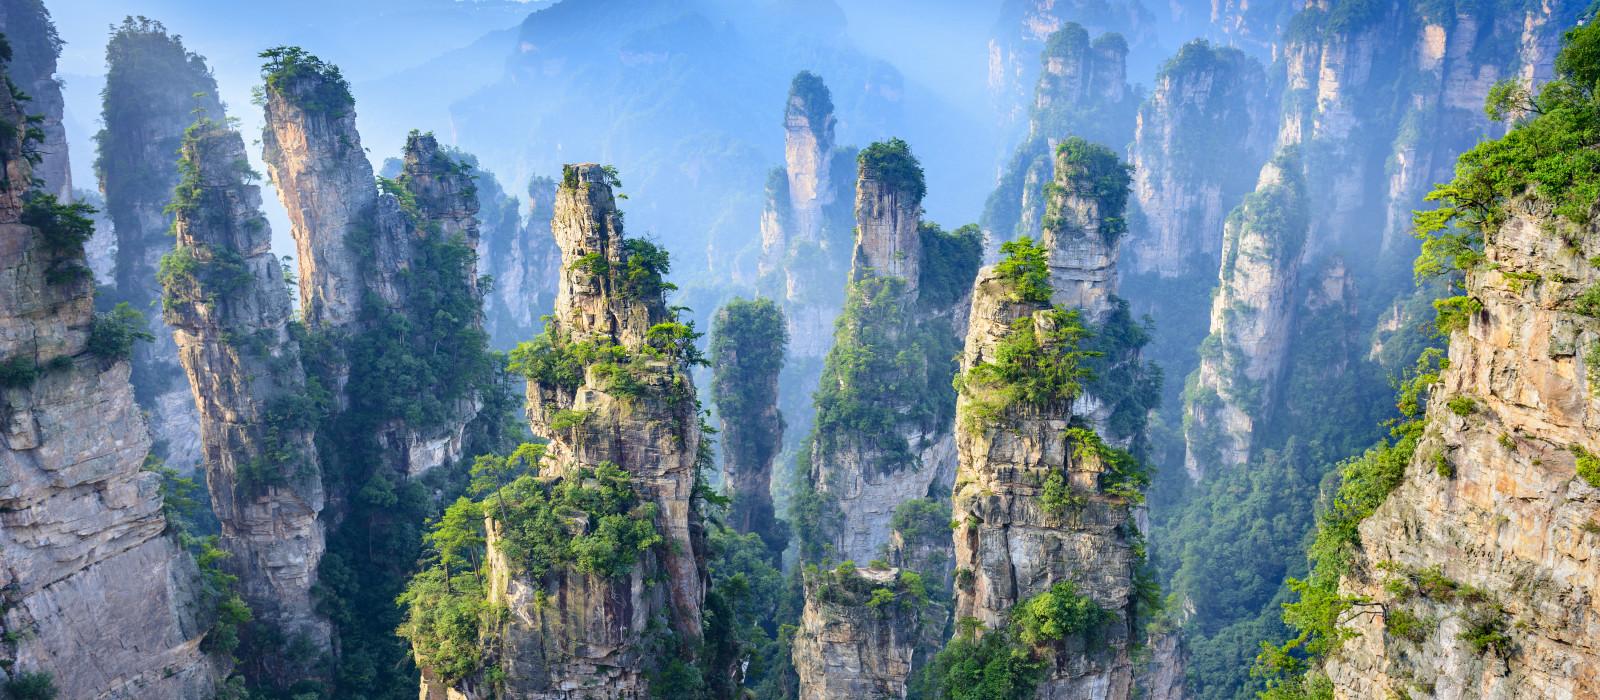 Reiseziel Zhangjiajie China